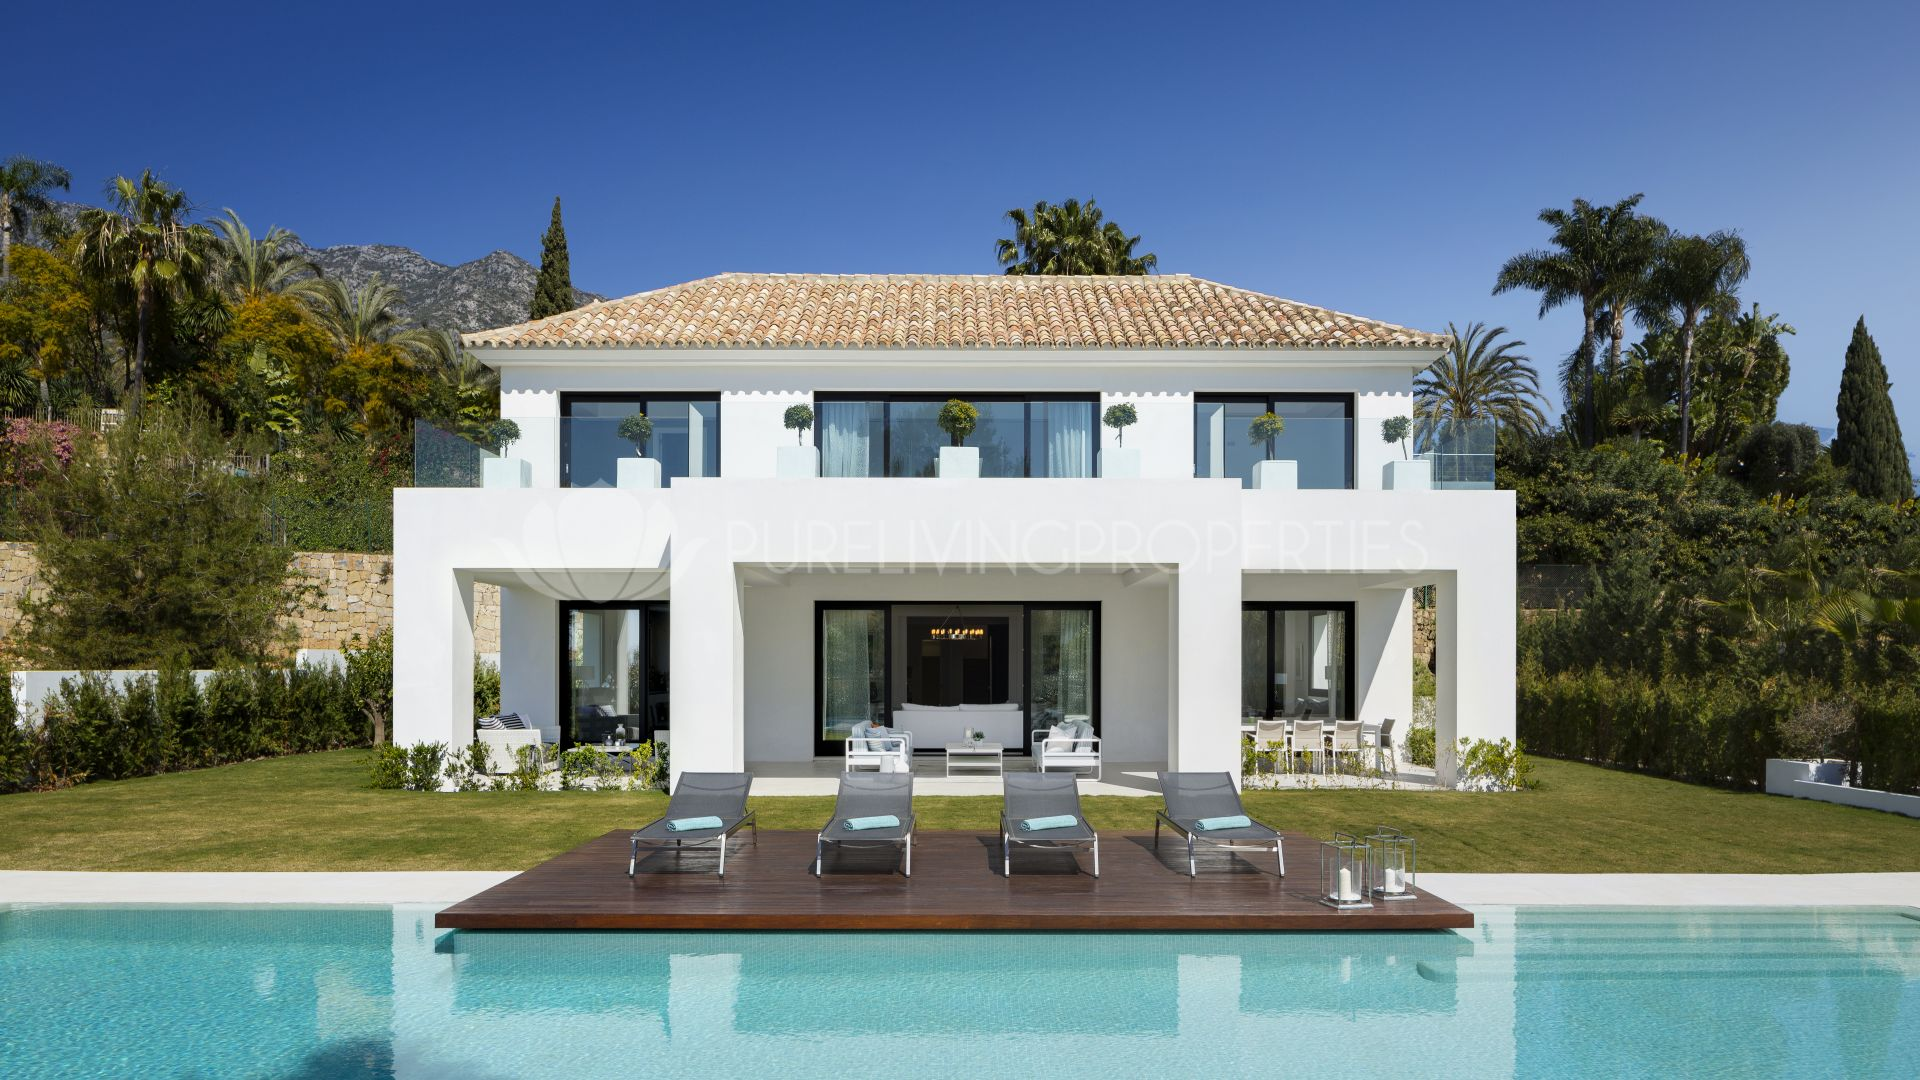 Properties for sale in marbella real estate in puente romano for Mansiones modernas